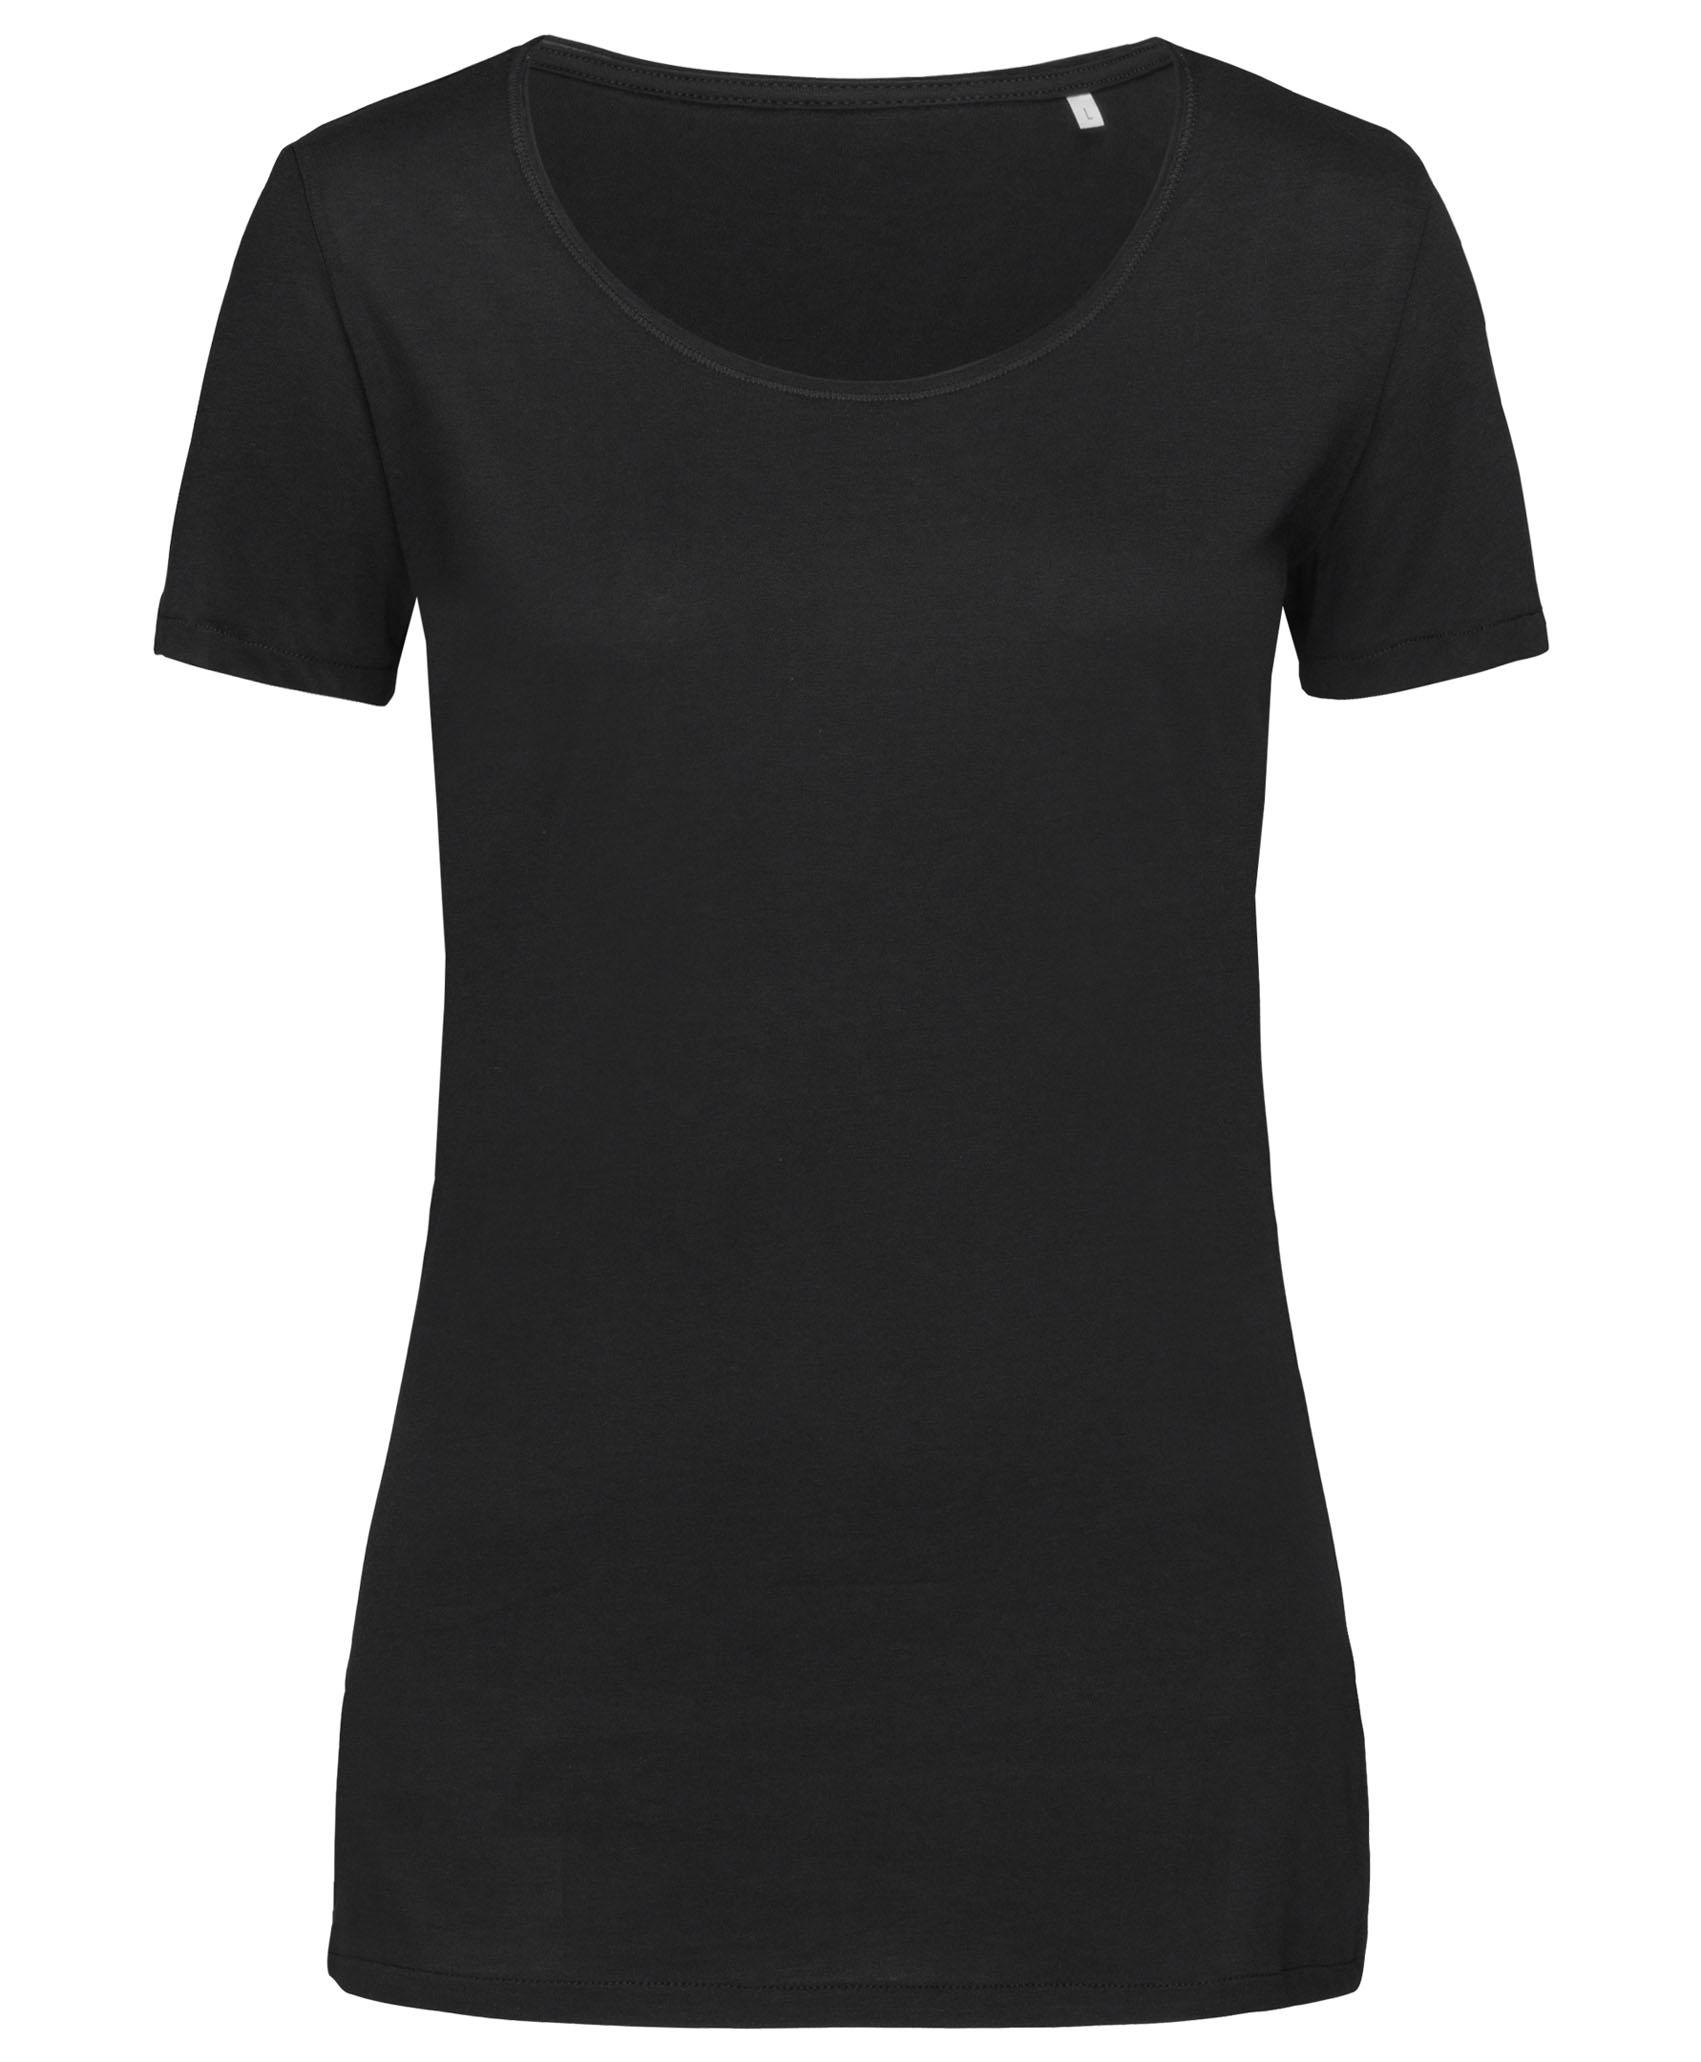 Stedman T-shirt Finest Cotton-T for her